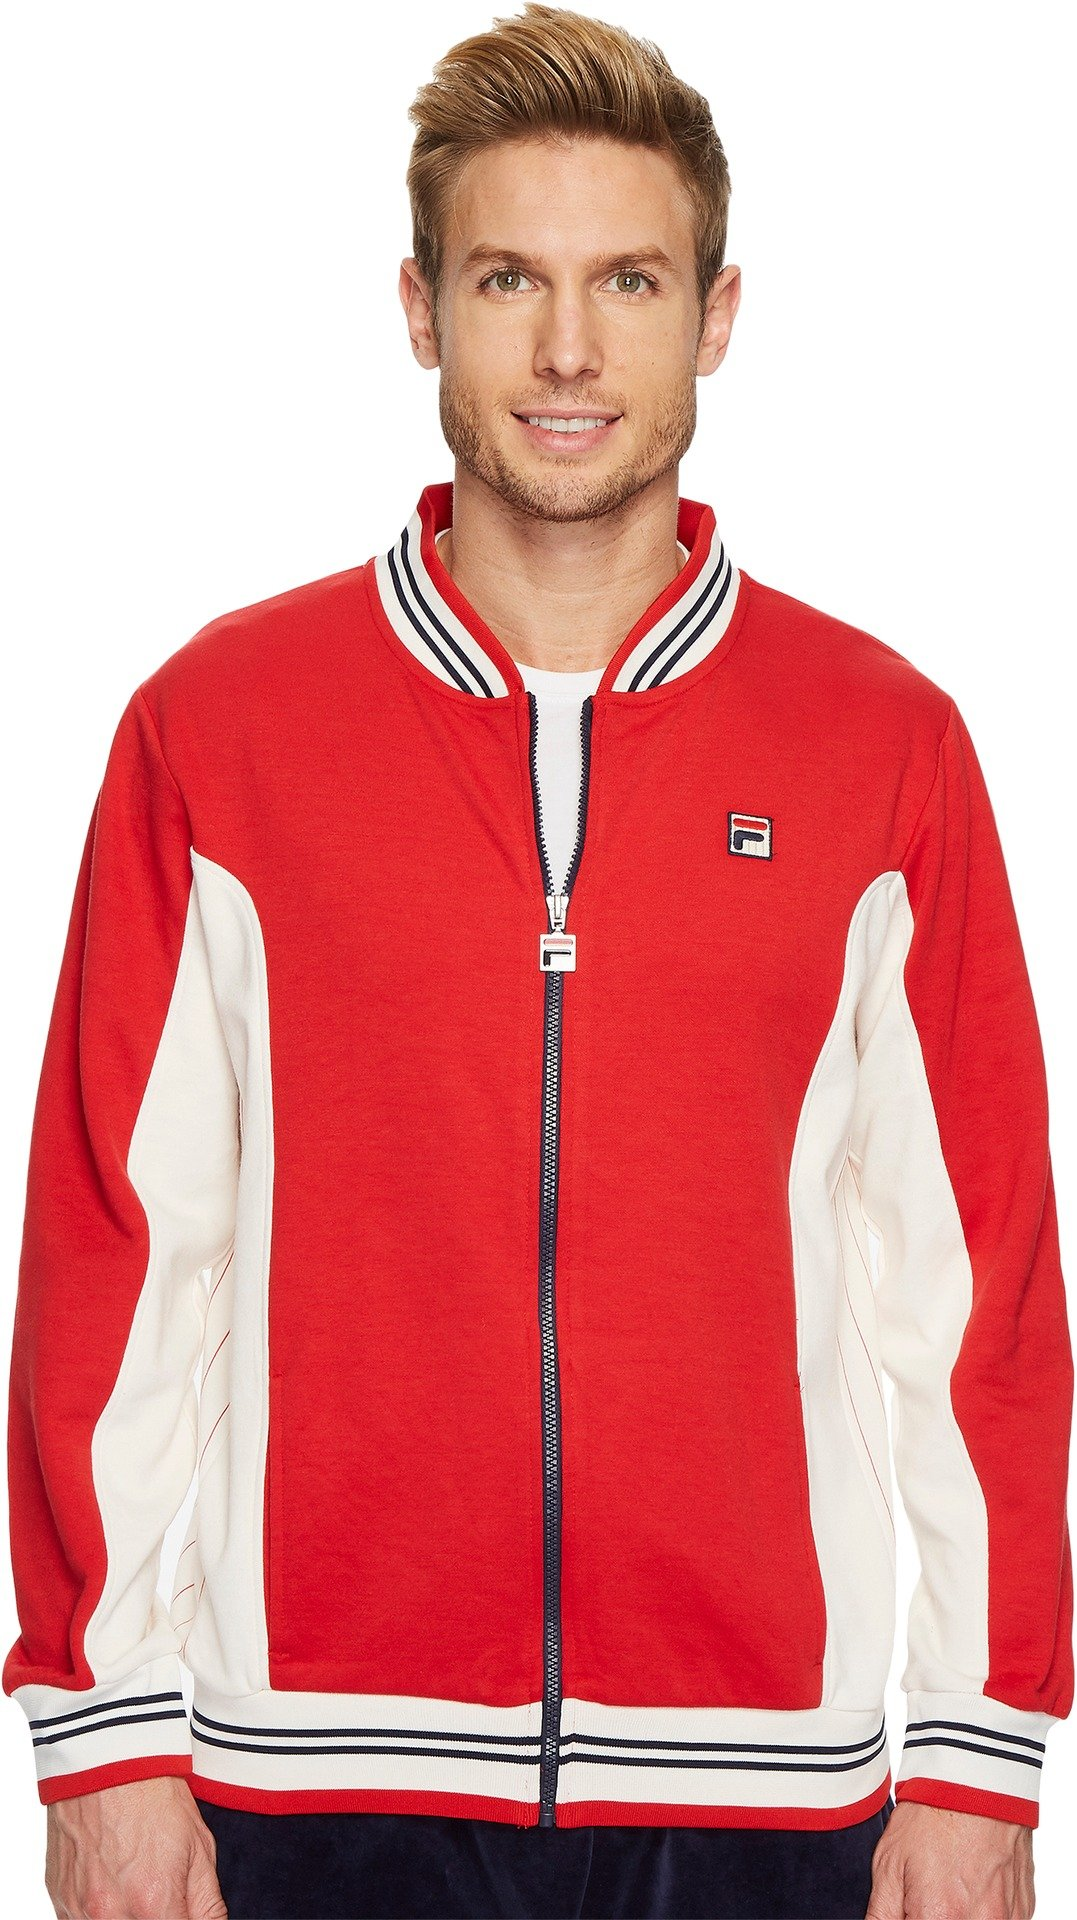 Fila Men's Settanta Jackets, Chinese Red, XL by Fila